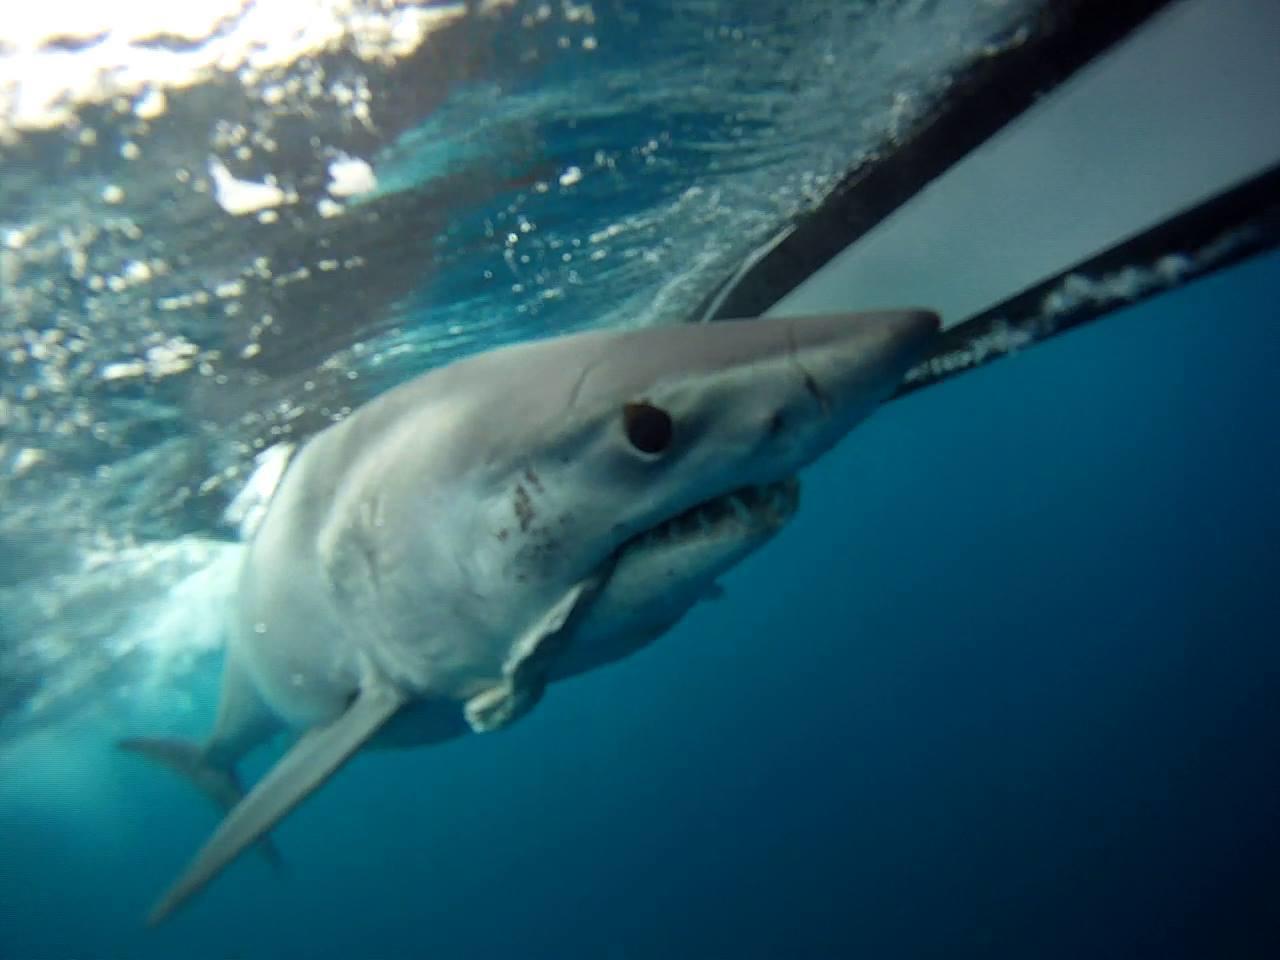 Shark fishing images world class shark fishing 600 pound mako shark under water thecheapjerseys Image collections